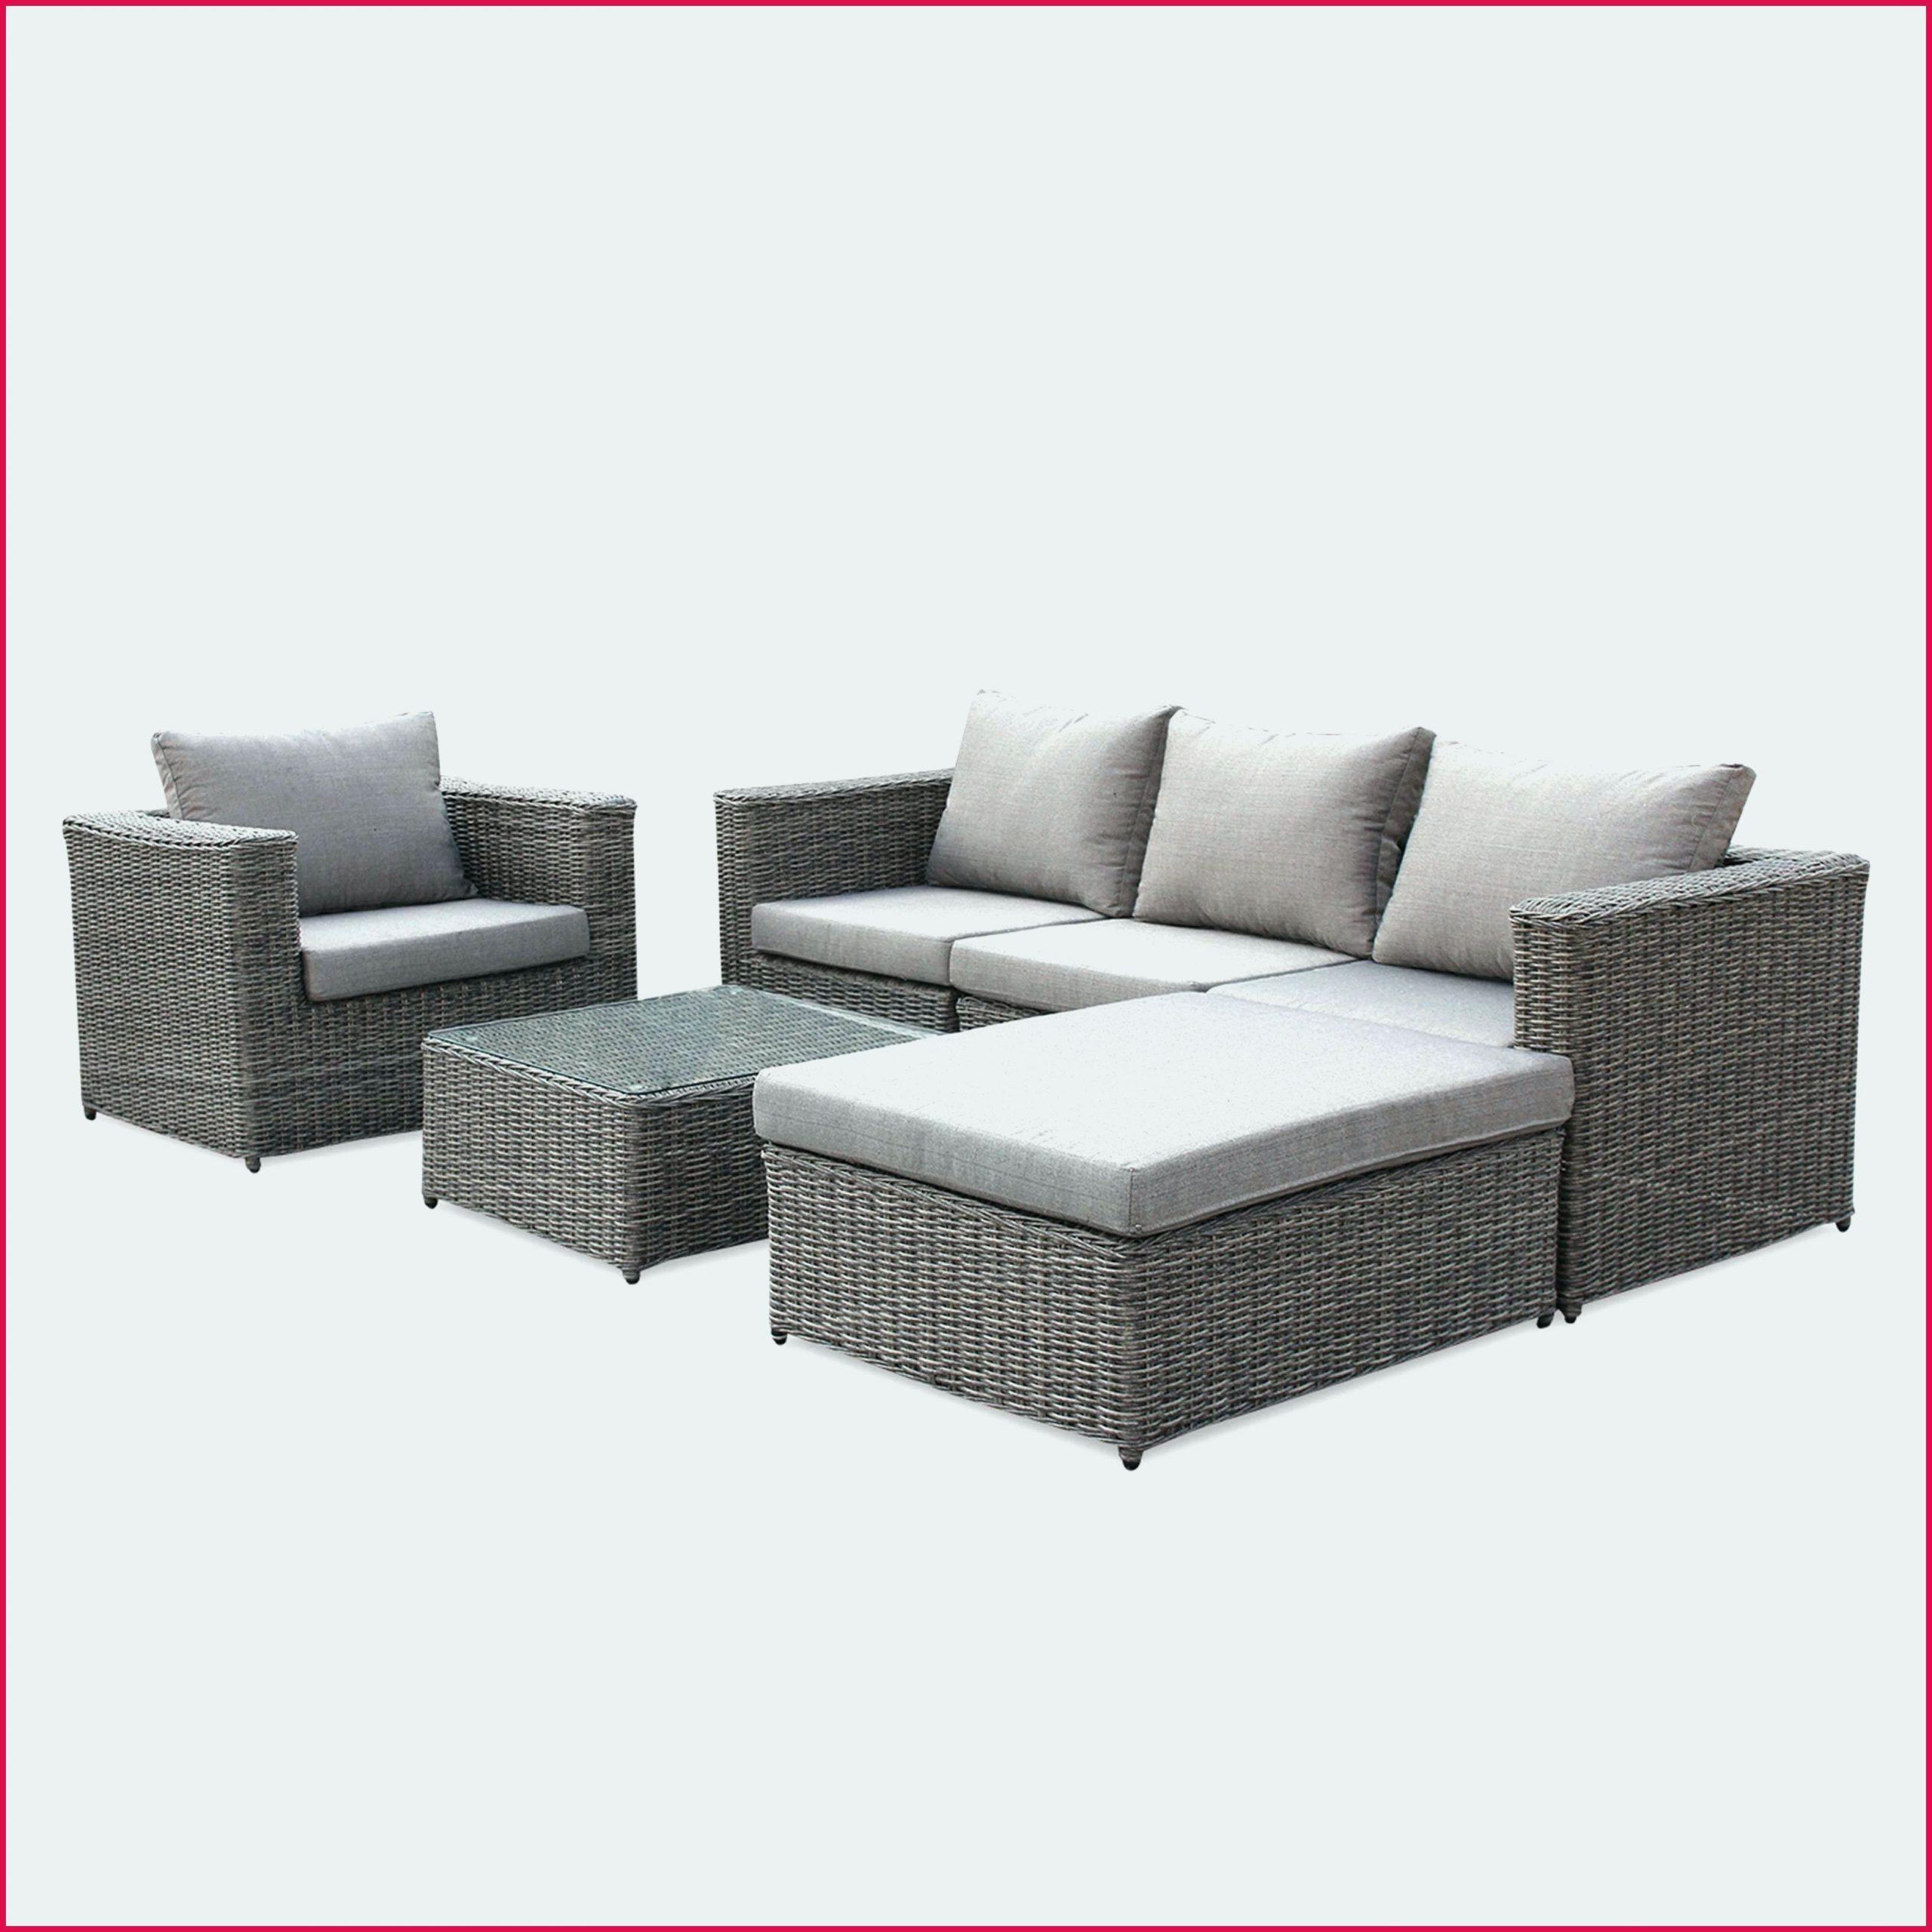 77 Salon Jardin Resine Gris Clair | Ikea Dan Merlin tout Salon De Jardin Resine Gris